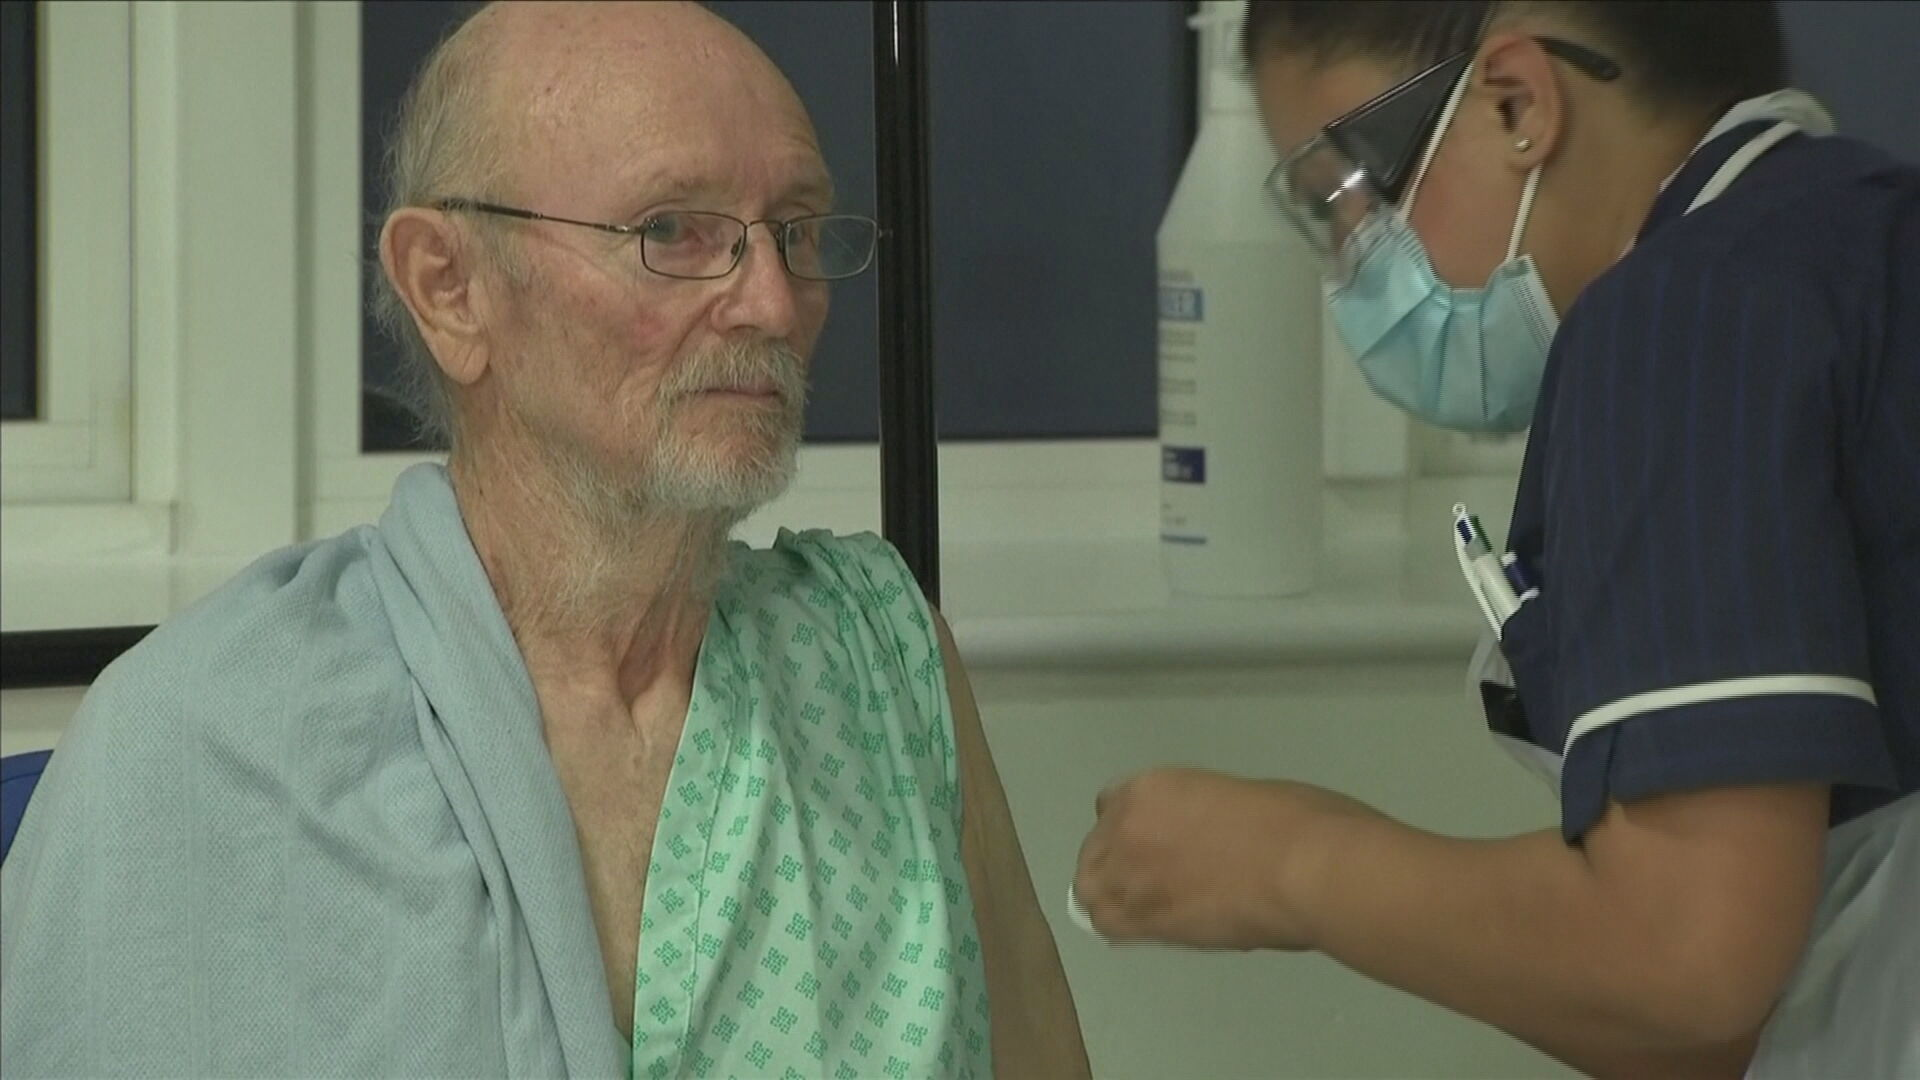 William Shakespeare, de 80 anos, foi o segundo a ser vacinado contra a Covid-19